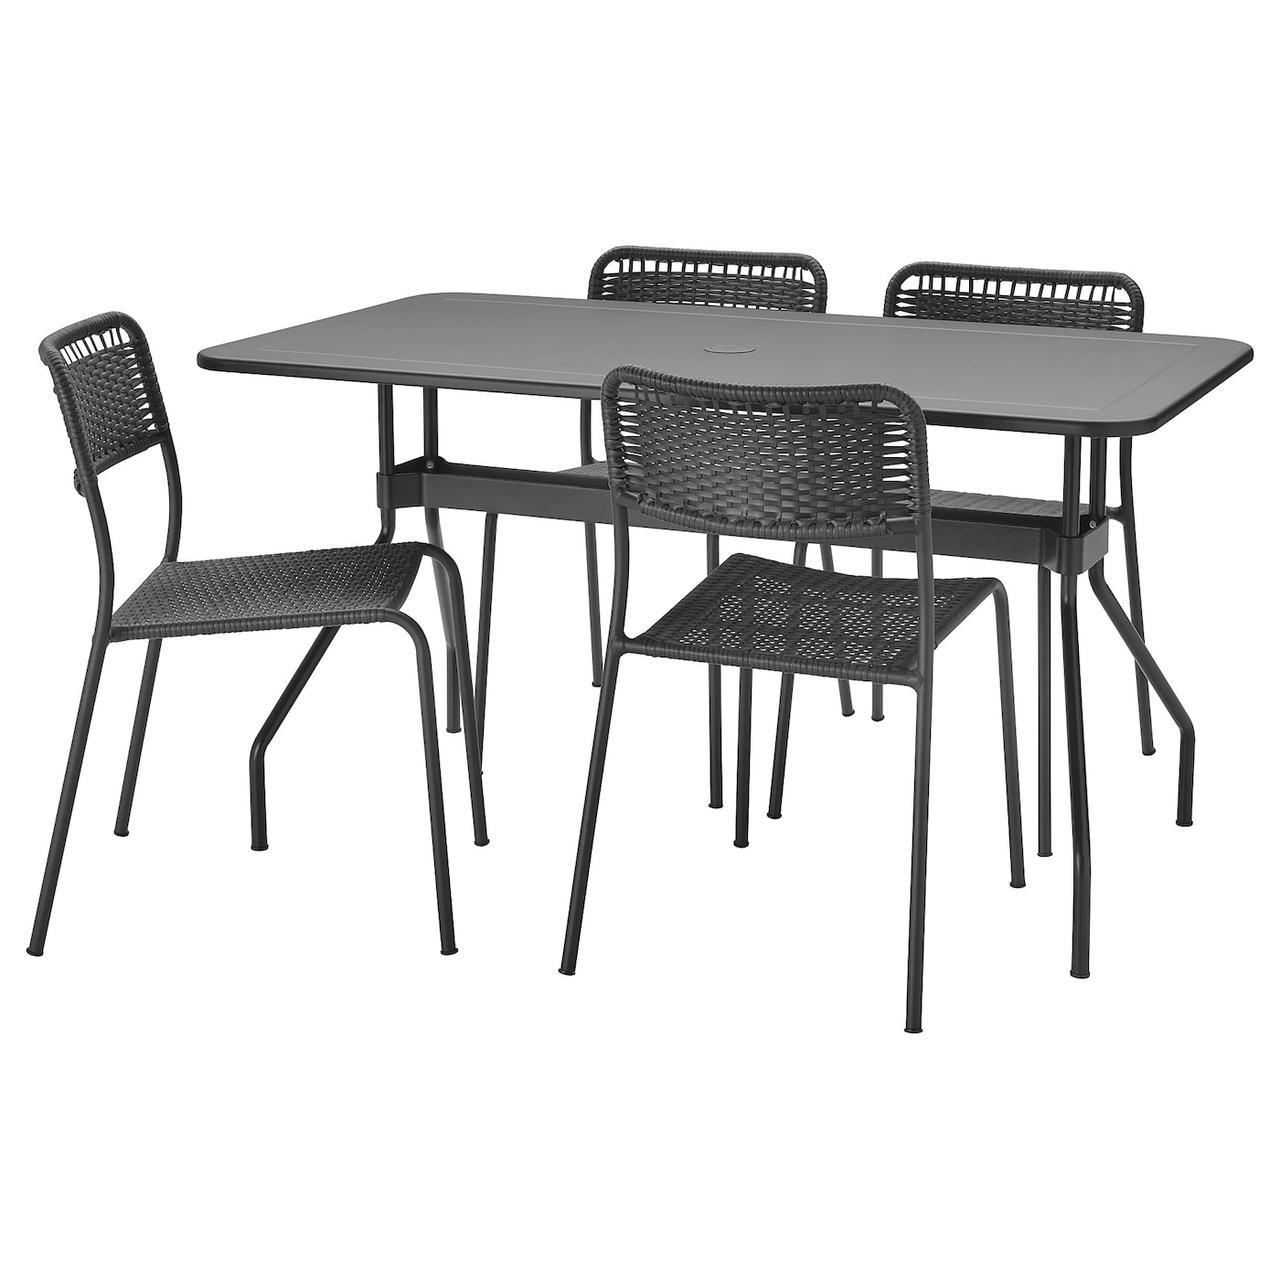 IKEA VIHOLMEN Стол 4 стула складные